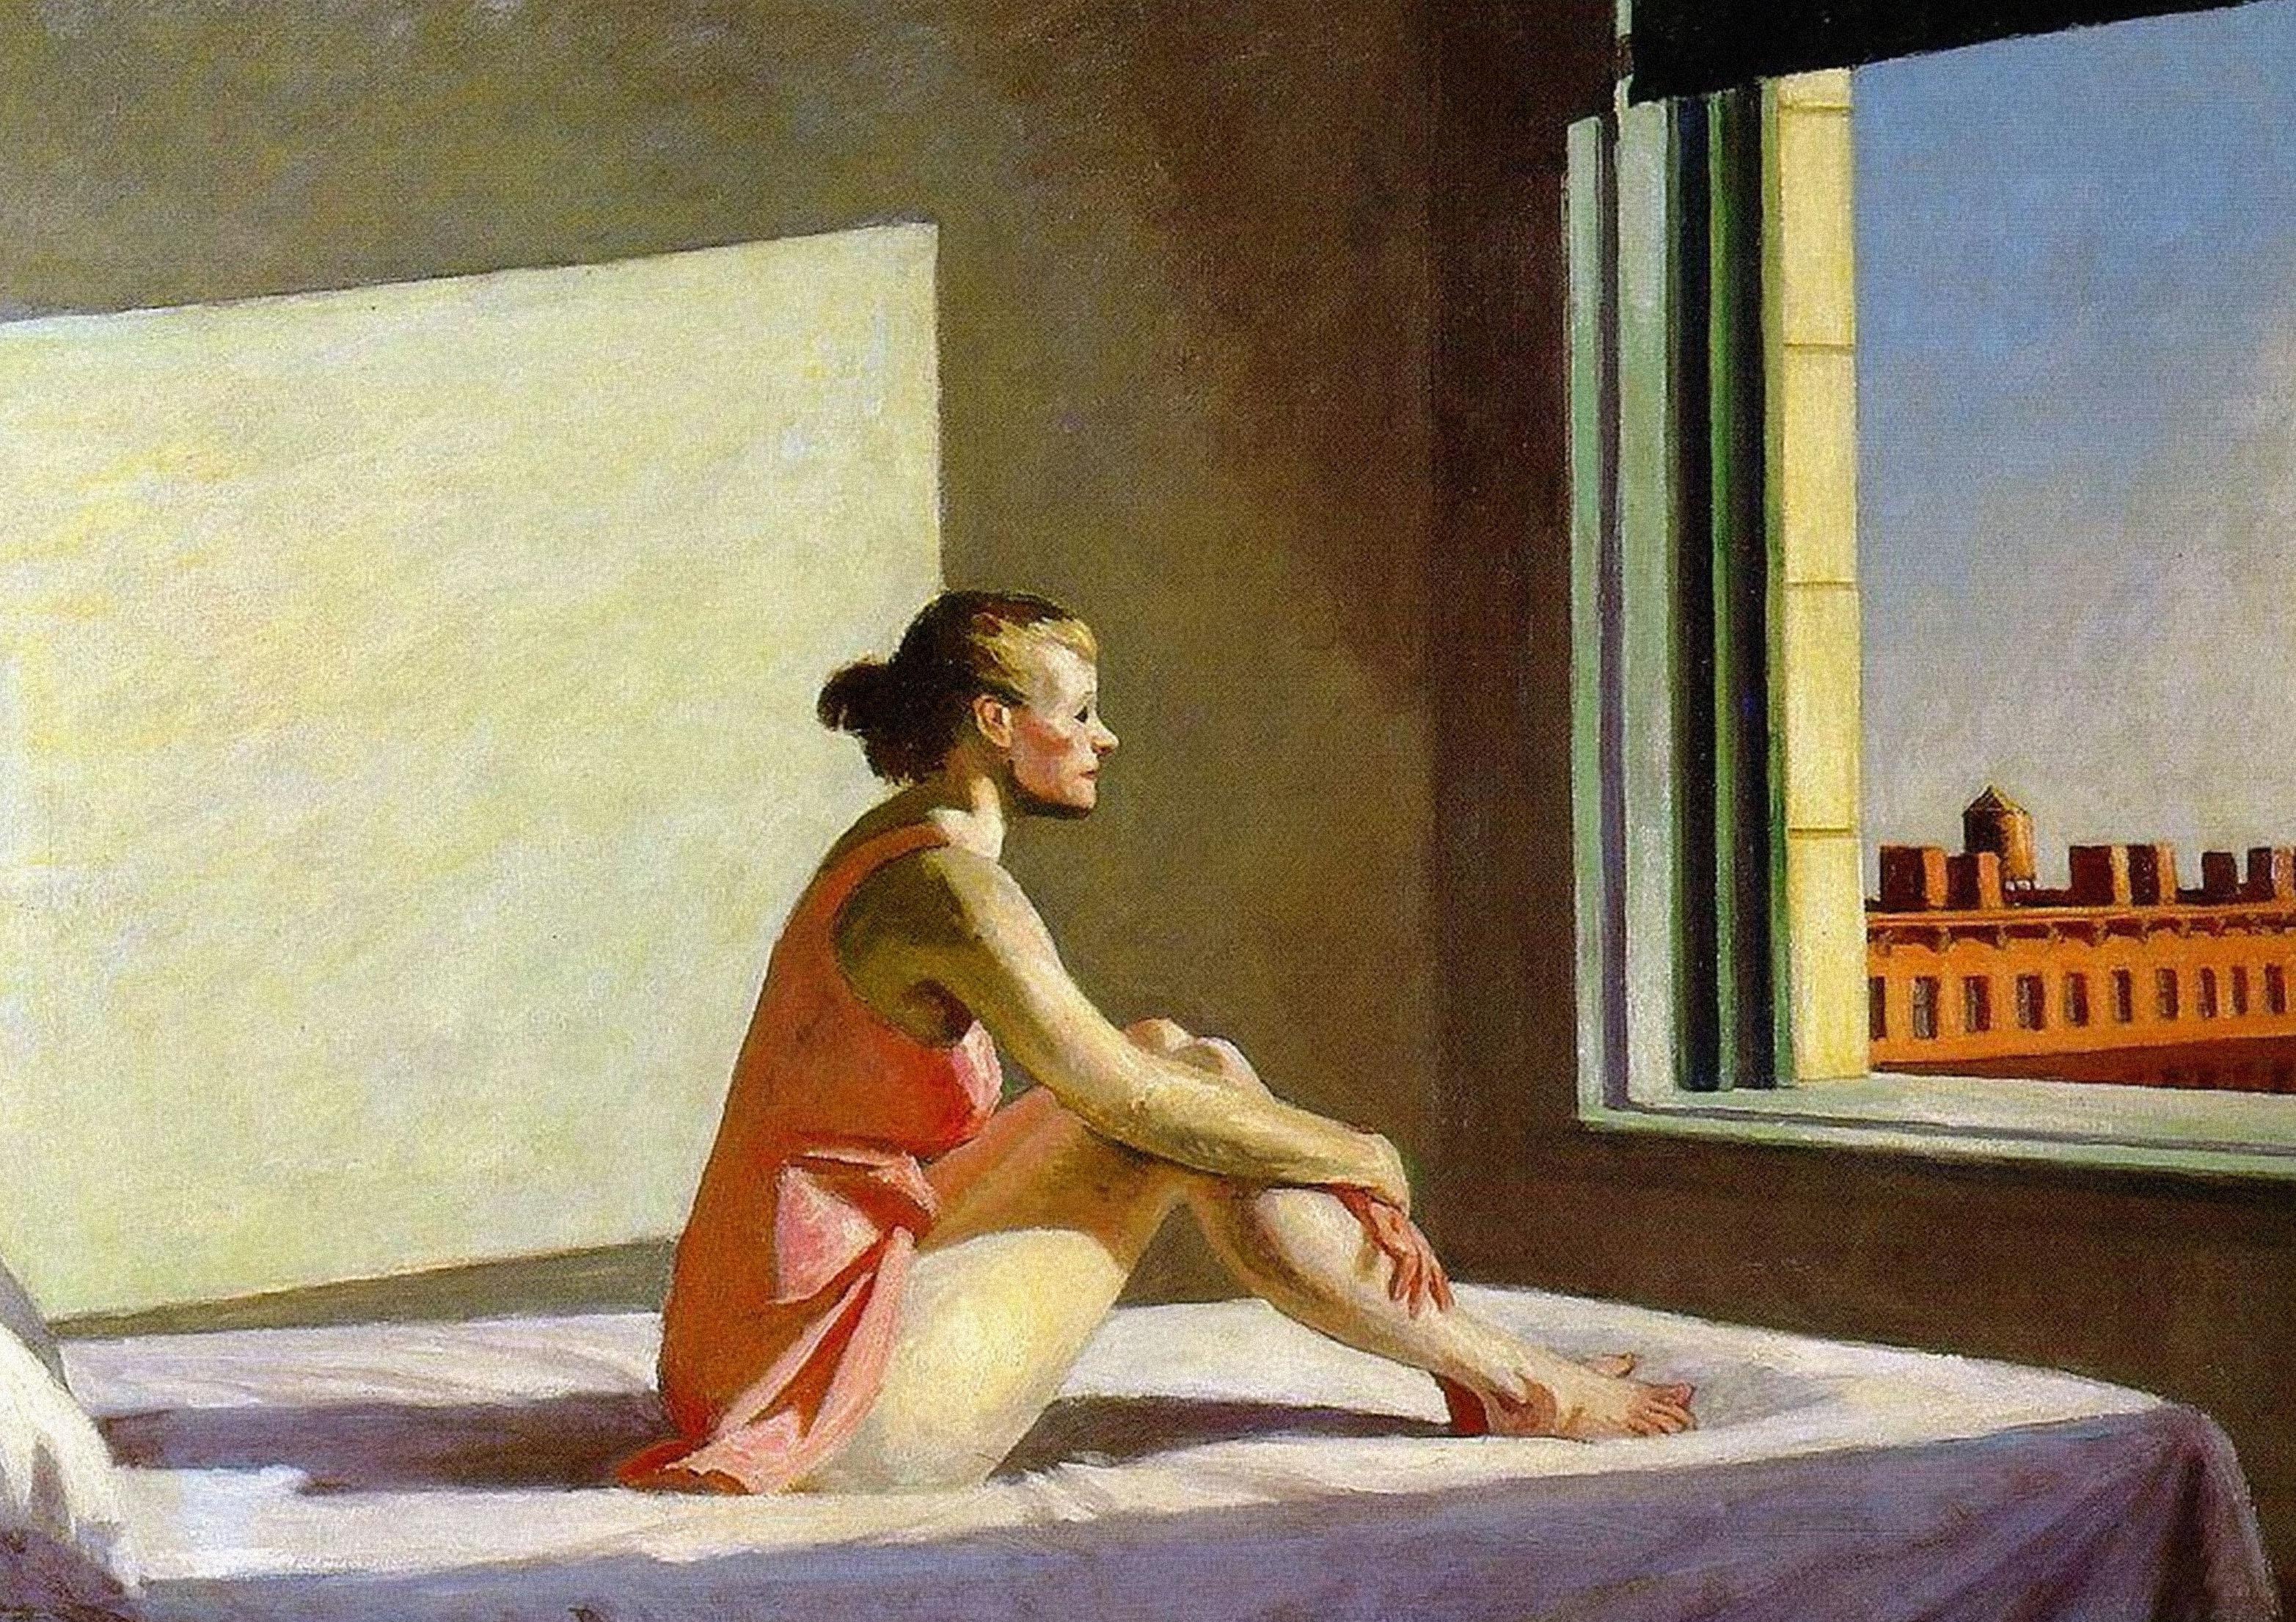 Can a sleepless night awaken creativity?